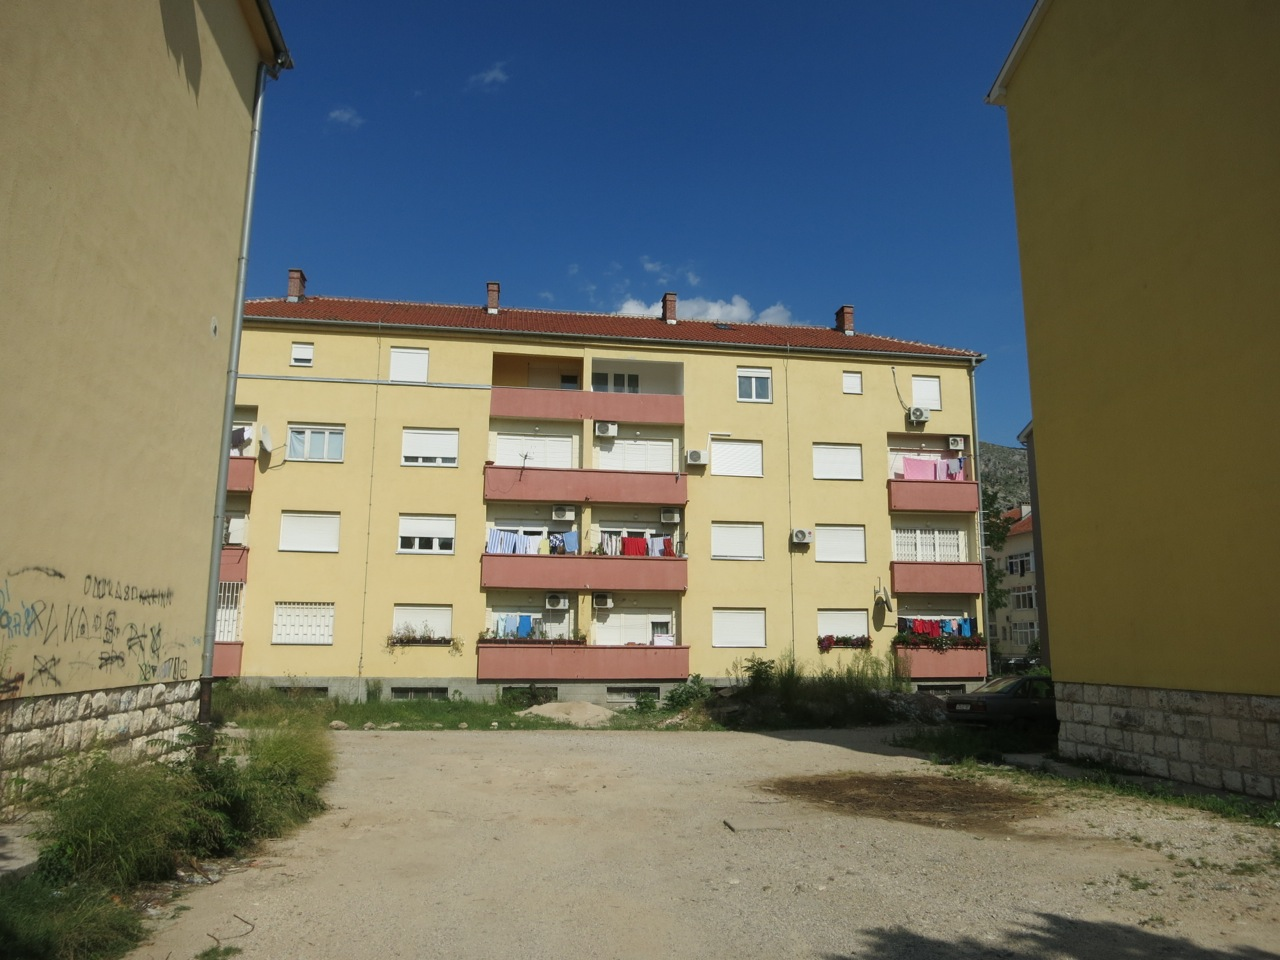 Mostar 1-07